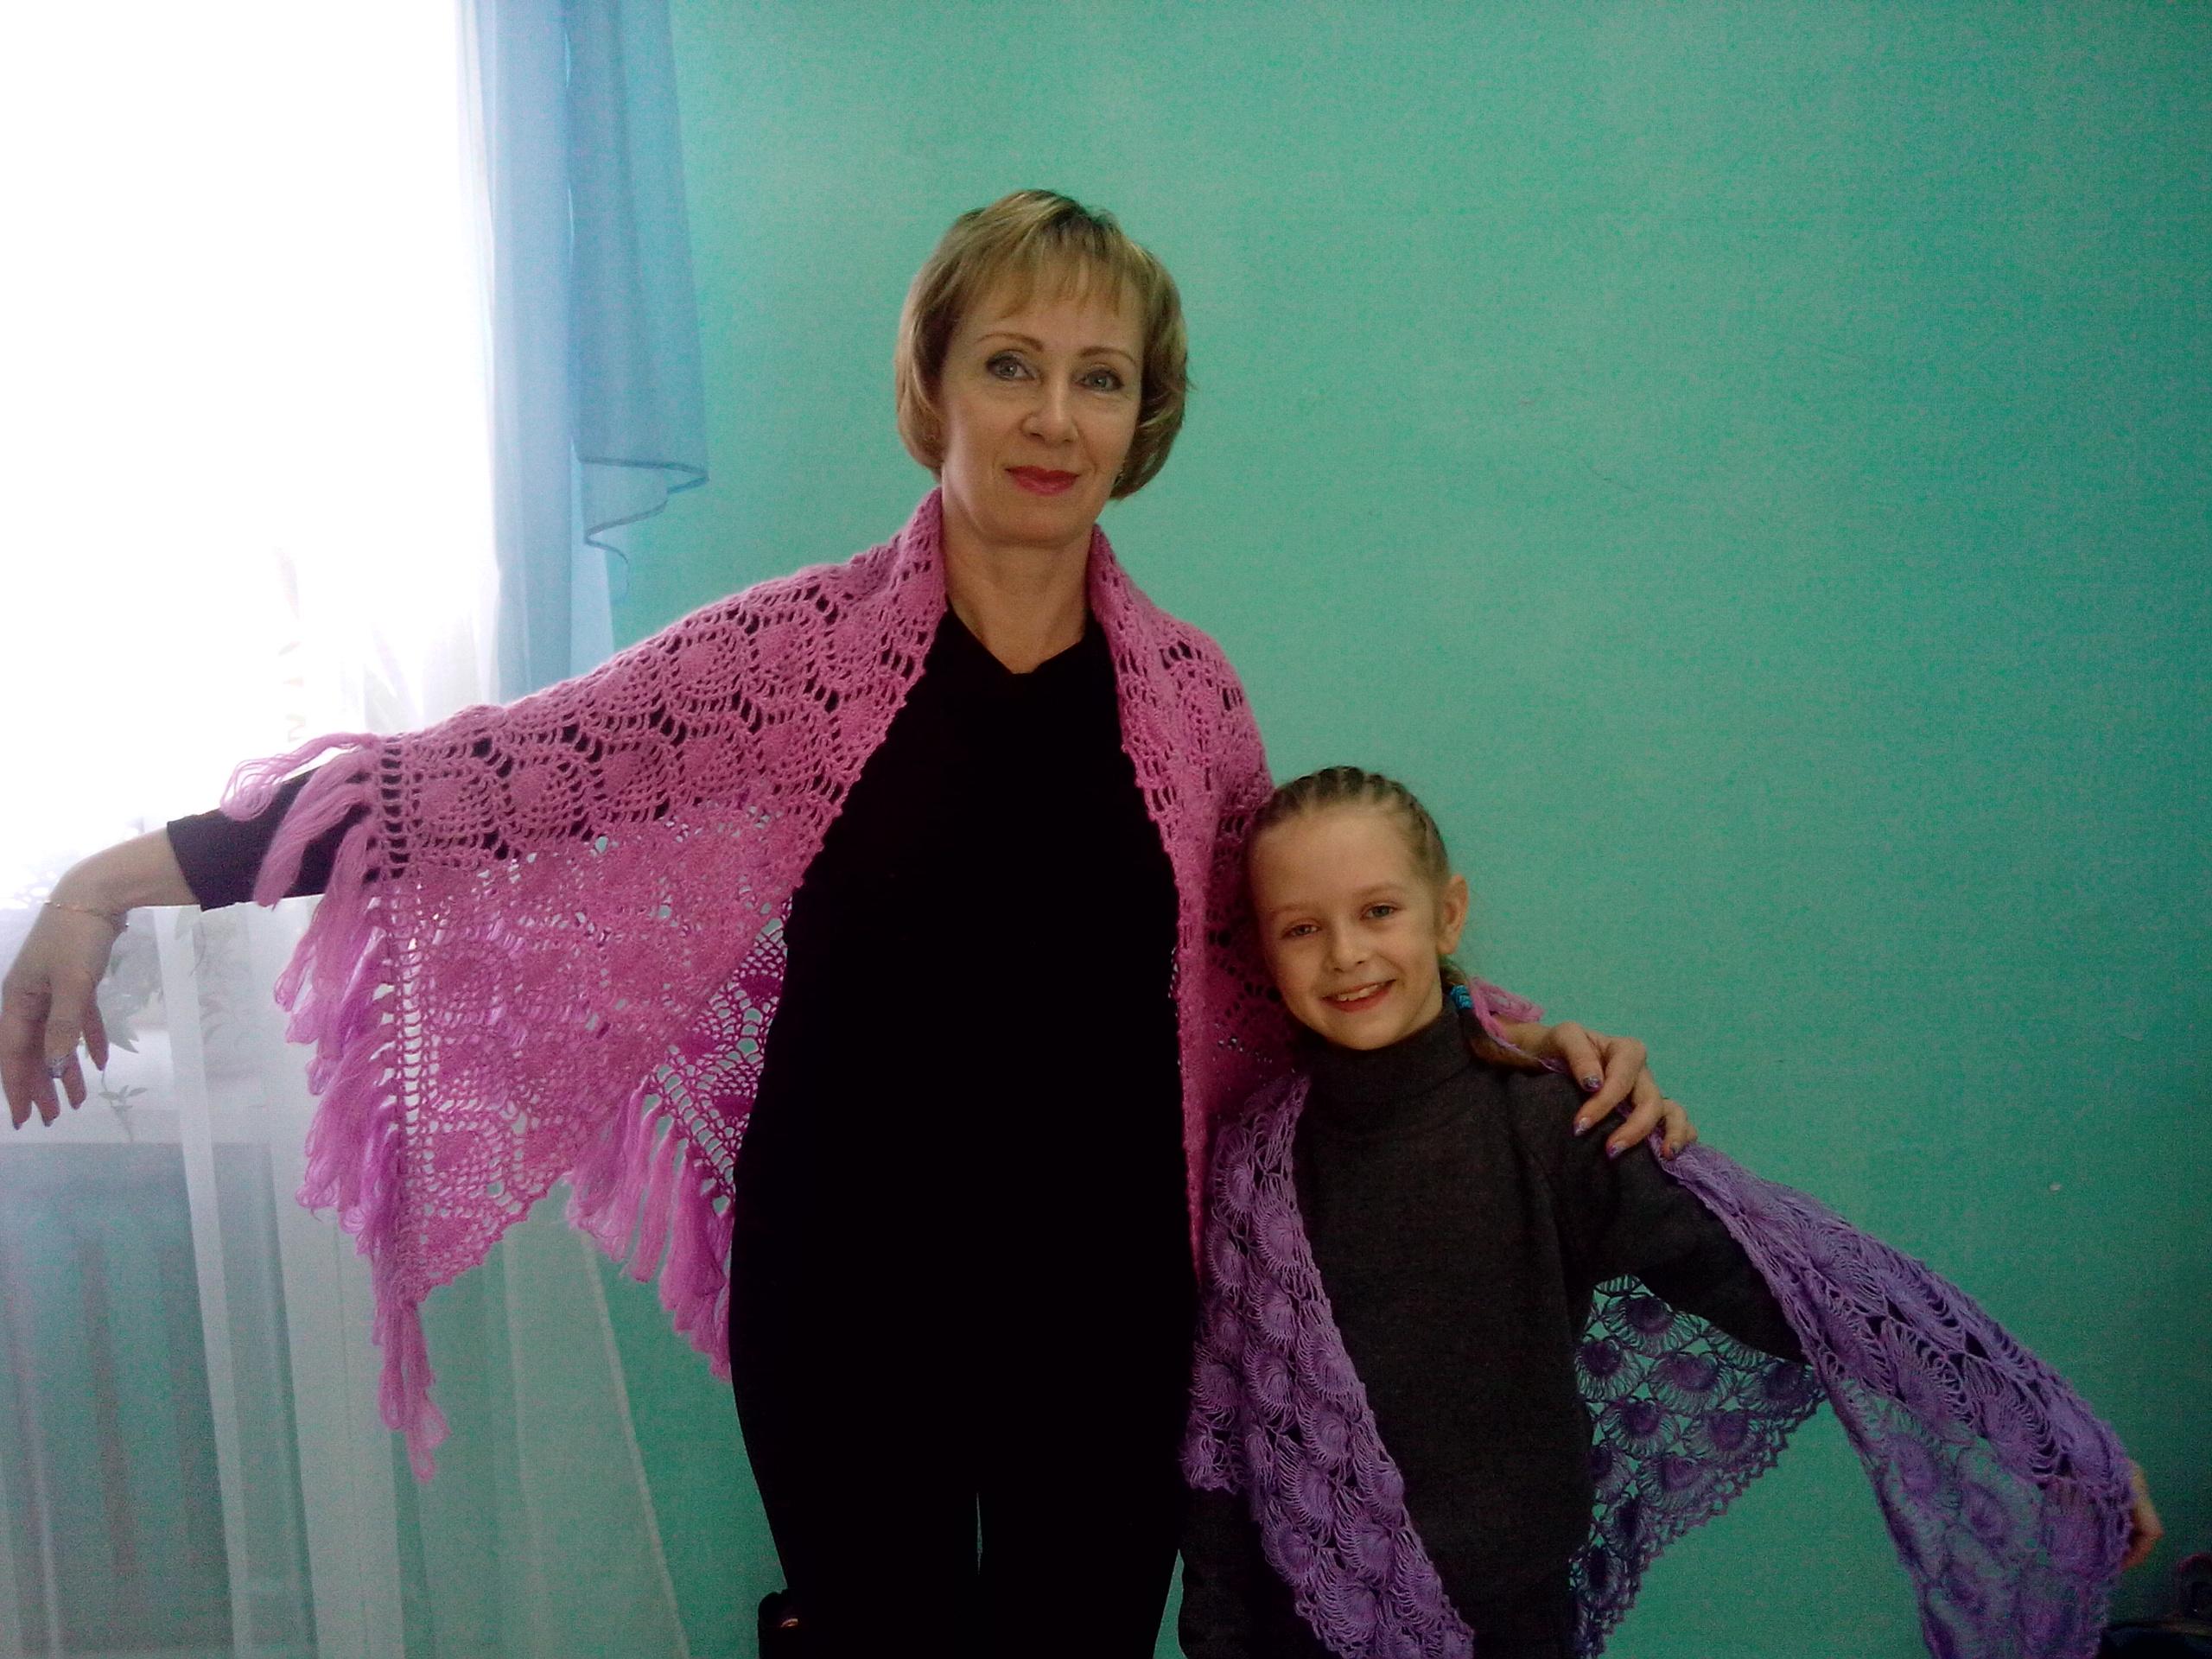 Тетя с любовником фото 6 фотография